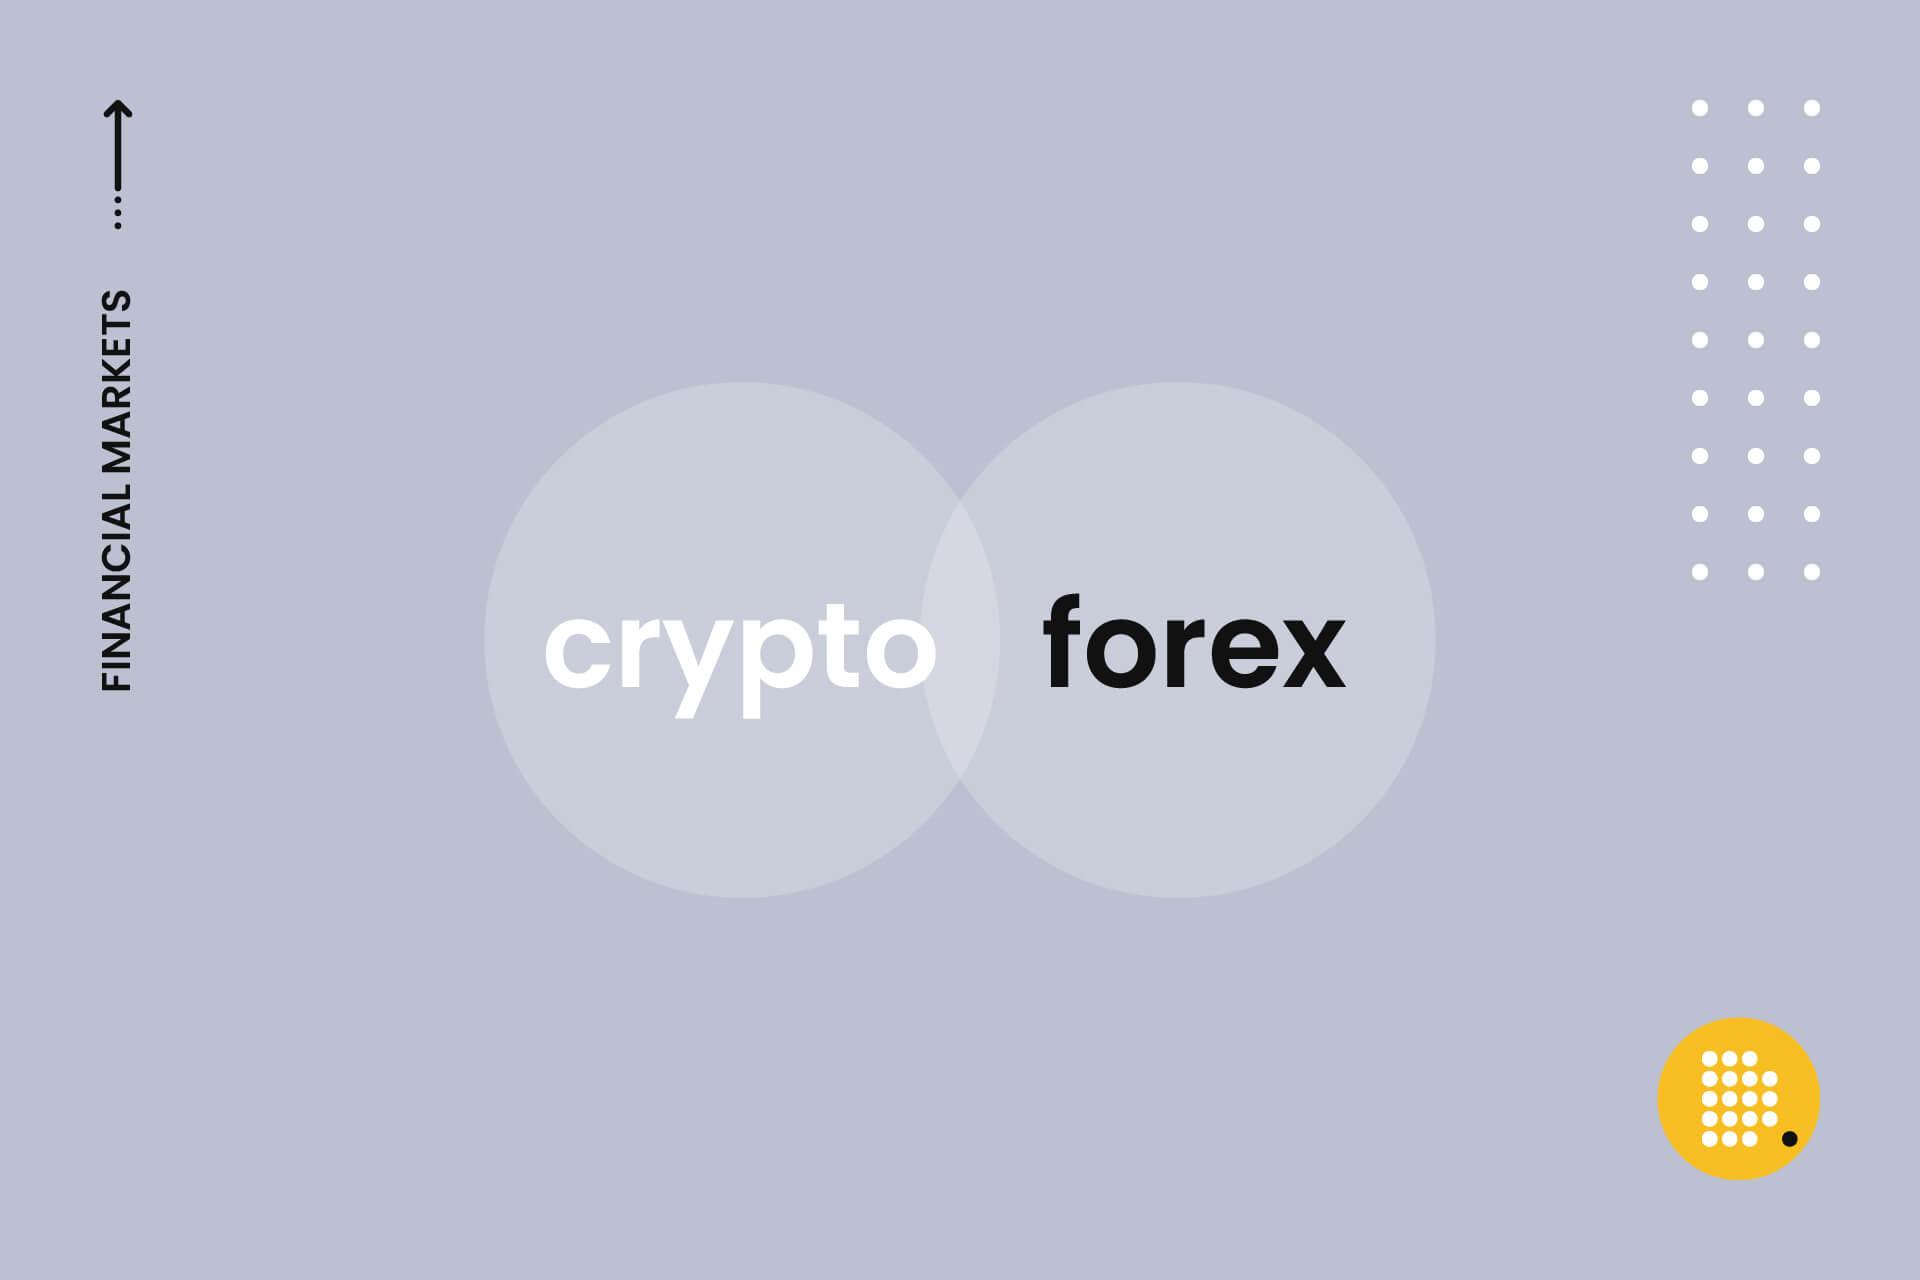 crypto or forex dailycoin